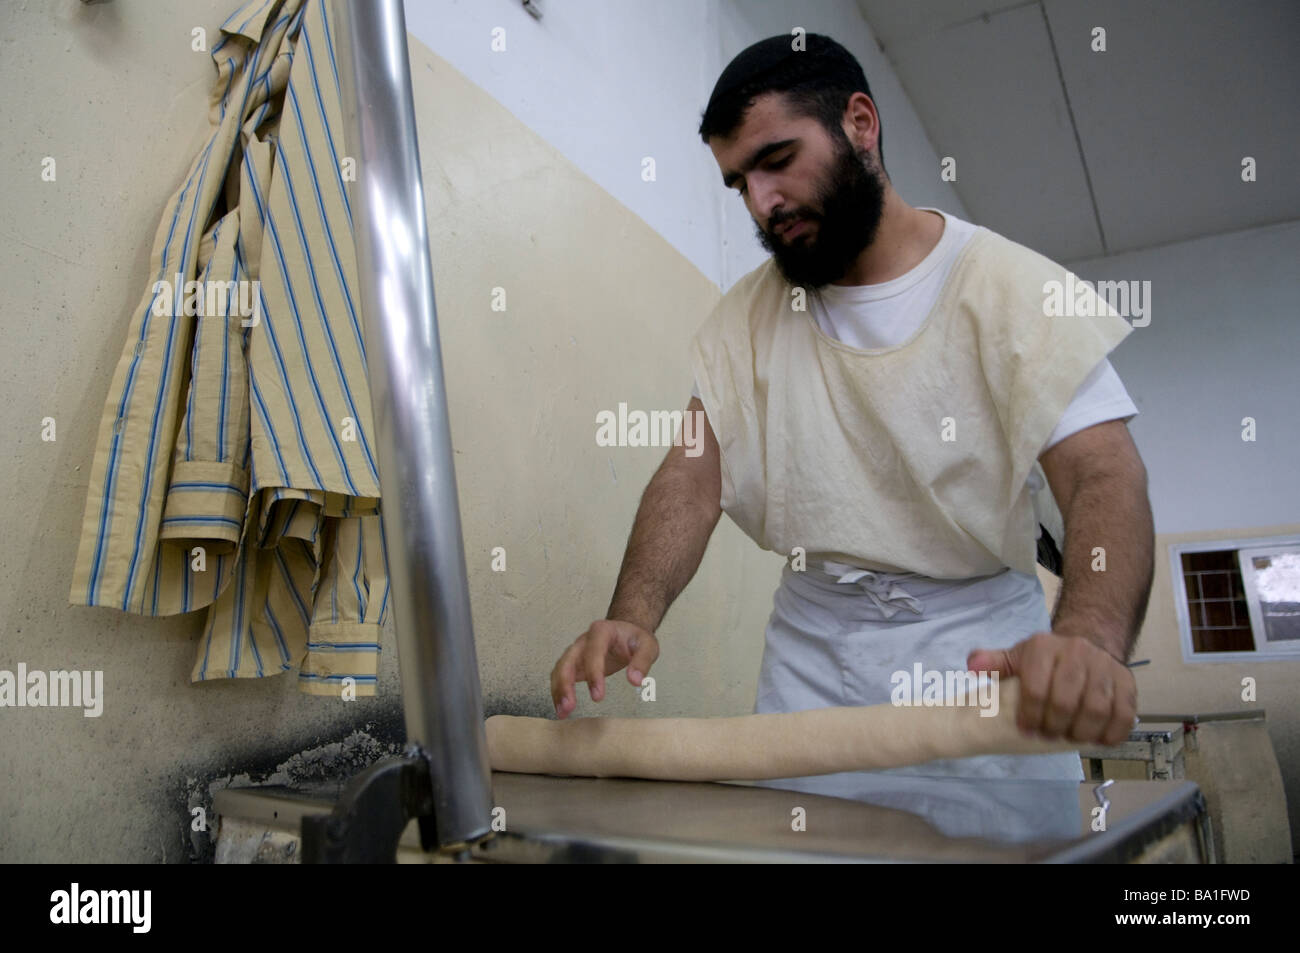 A religious Jew preparing Matzah traditional handmade Passover unleavened bread in Kfar Chabad or Habad village - Stock Image